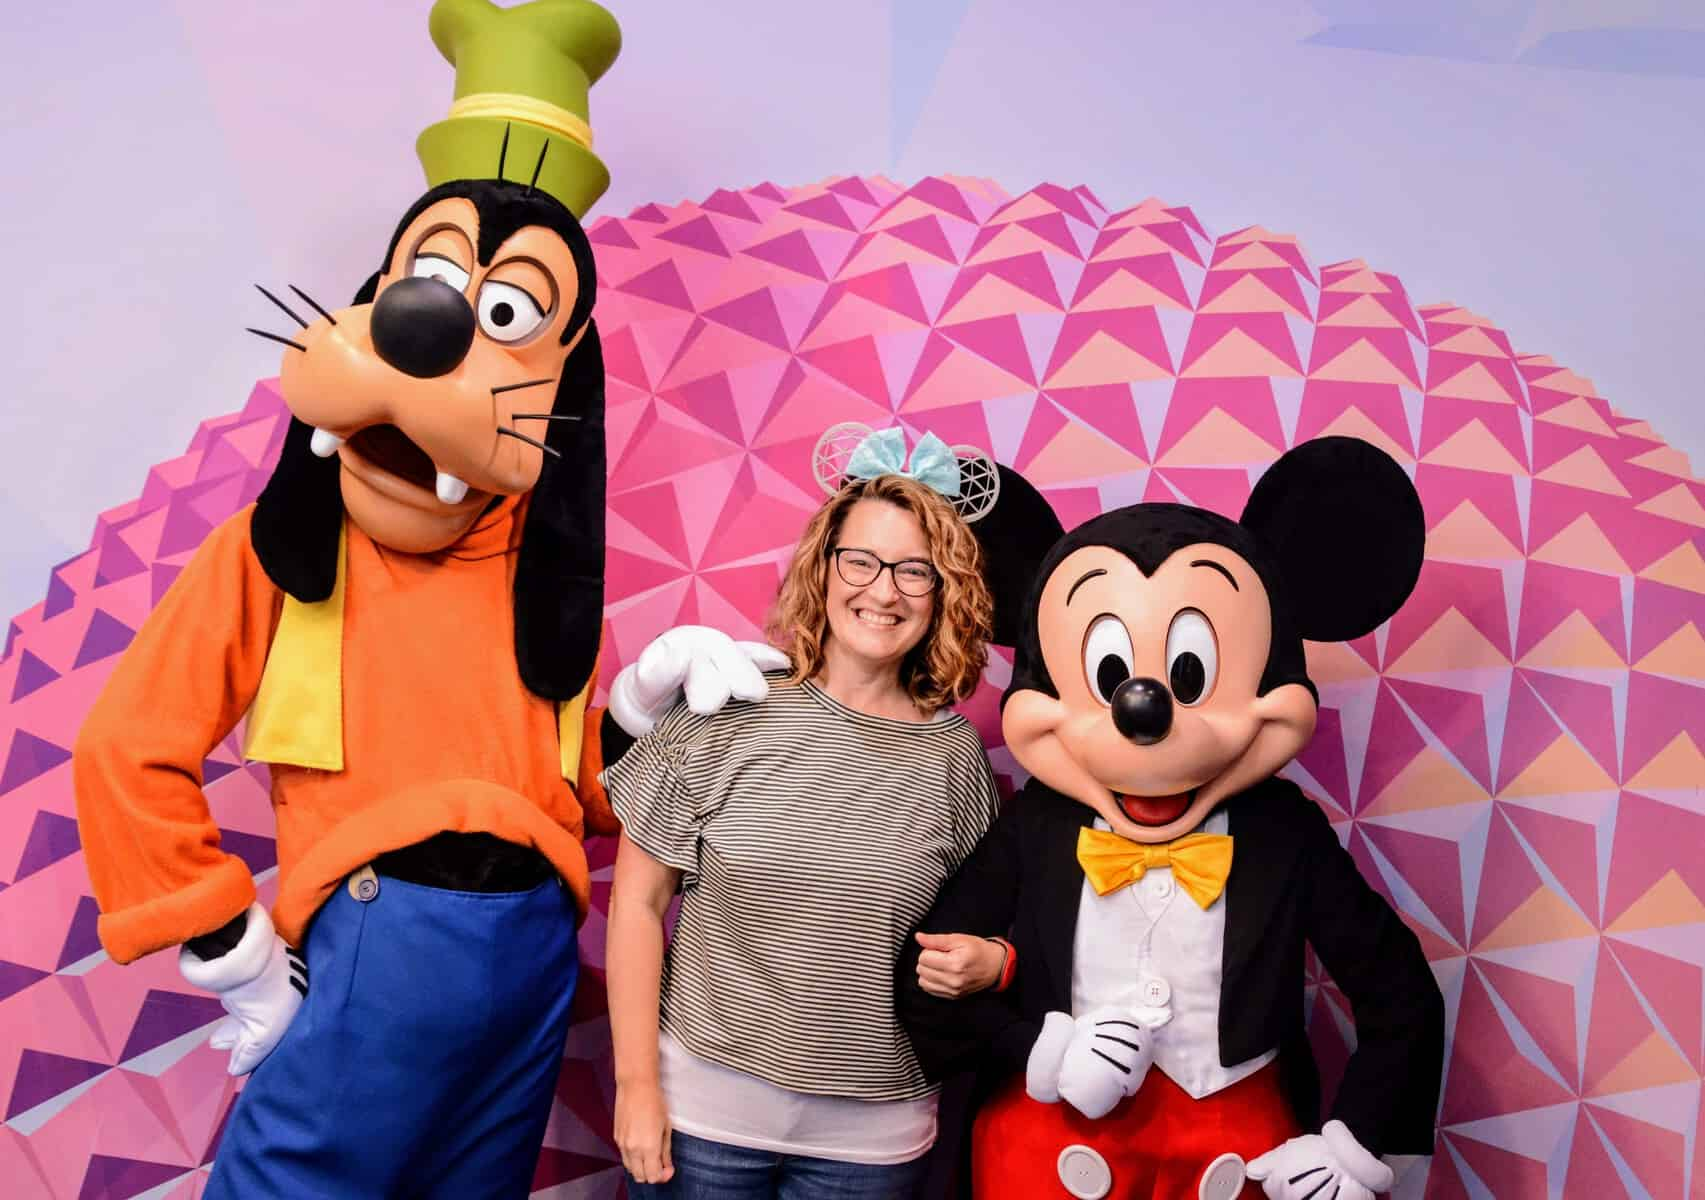 Shannon, Mickey, and Goofy